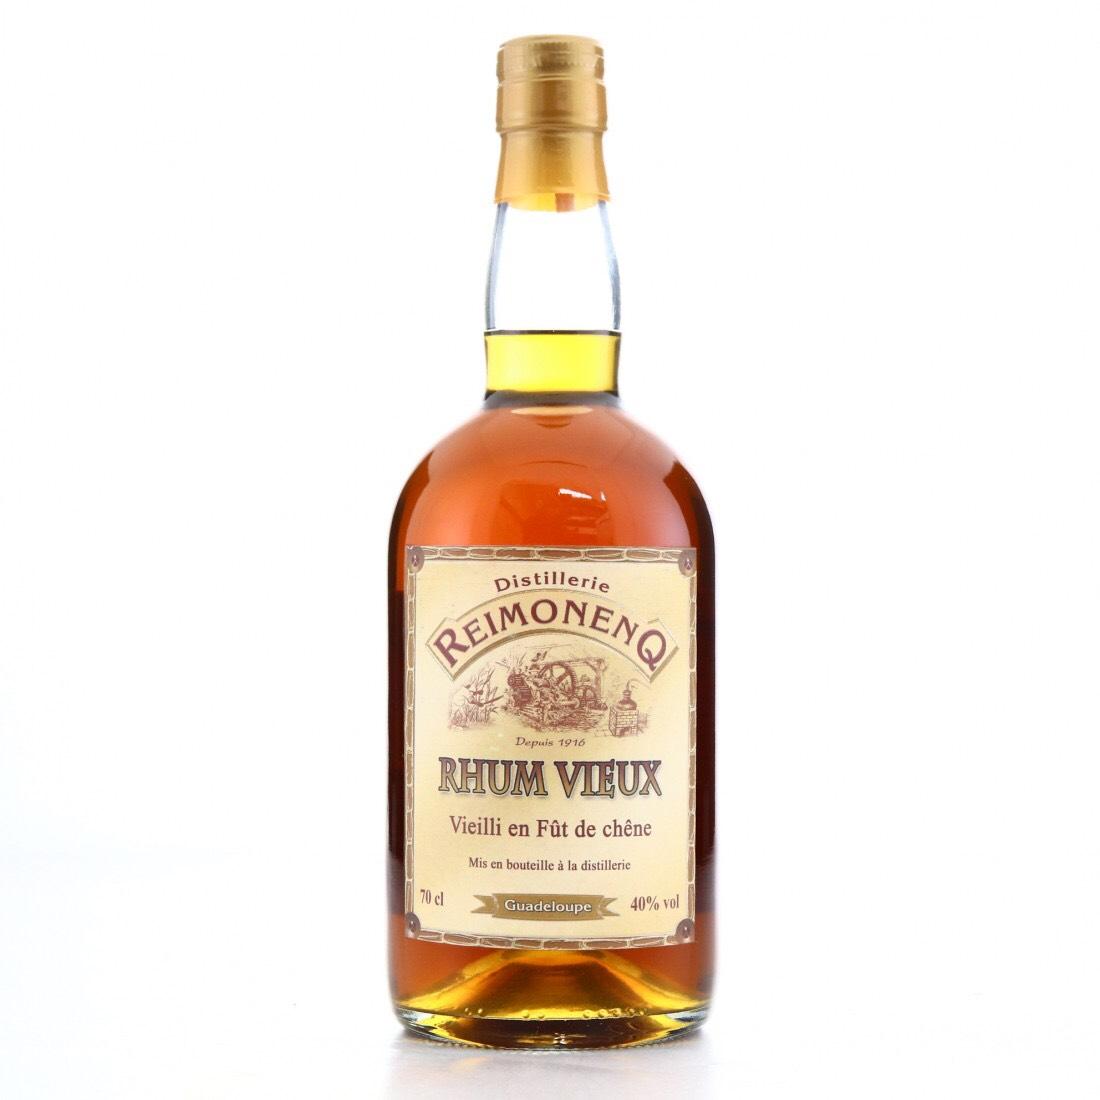 Bottle image of Rhum Vieux 3 ans